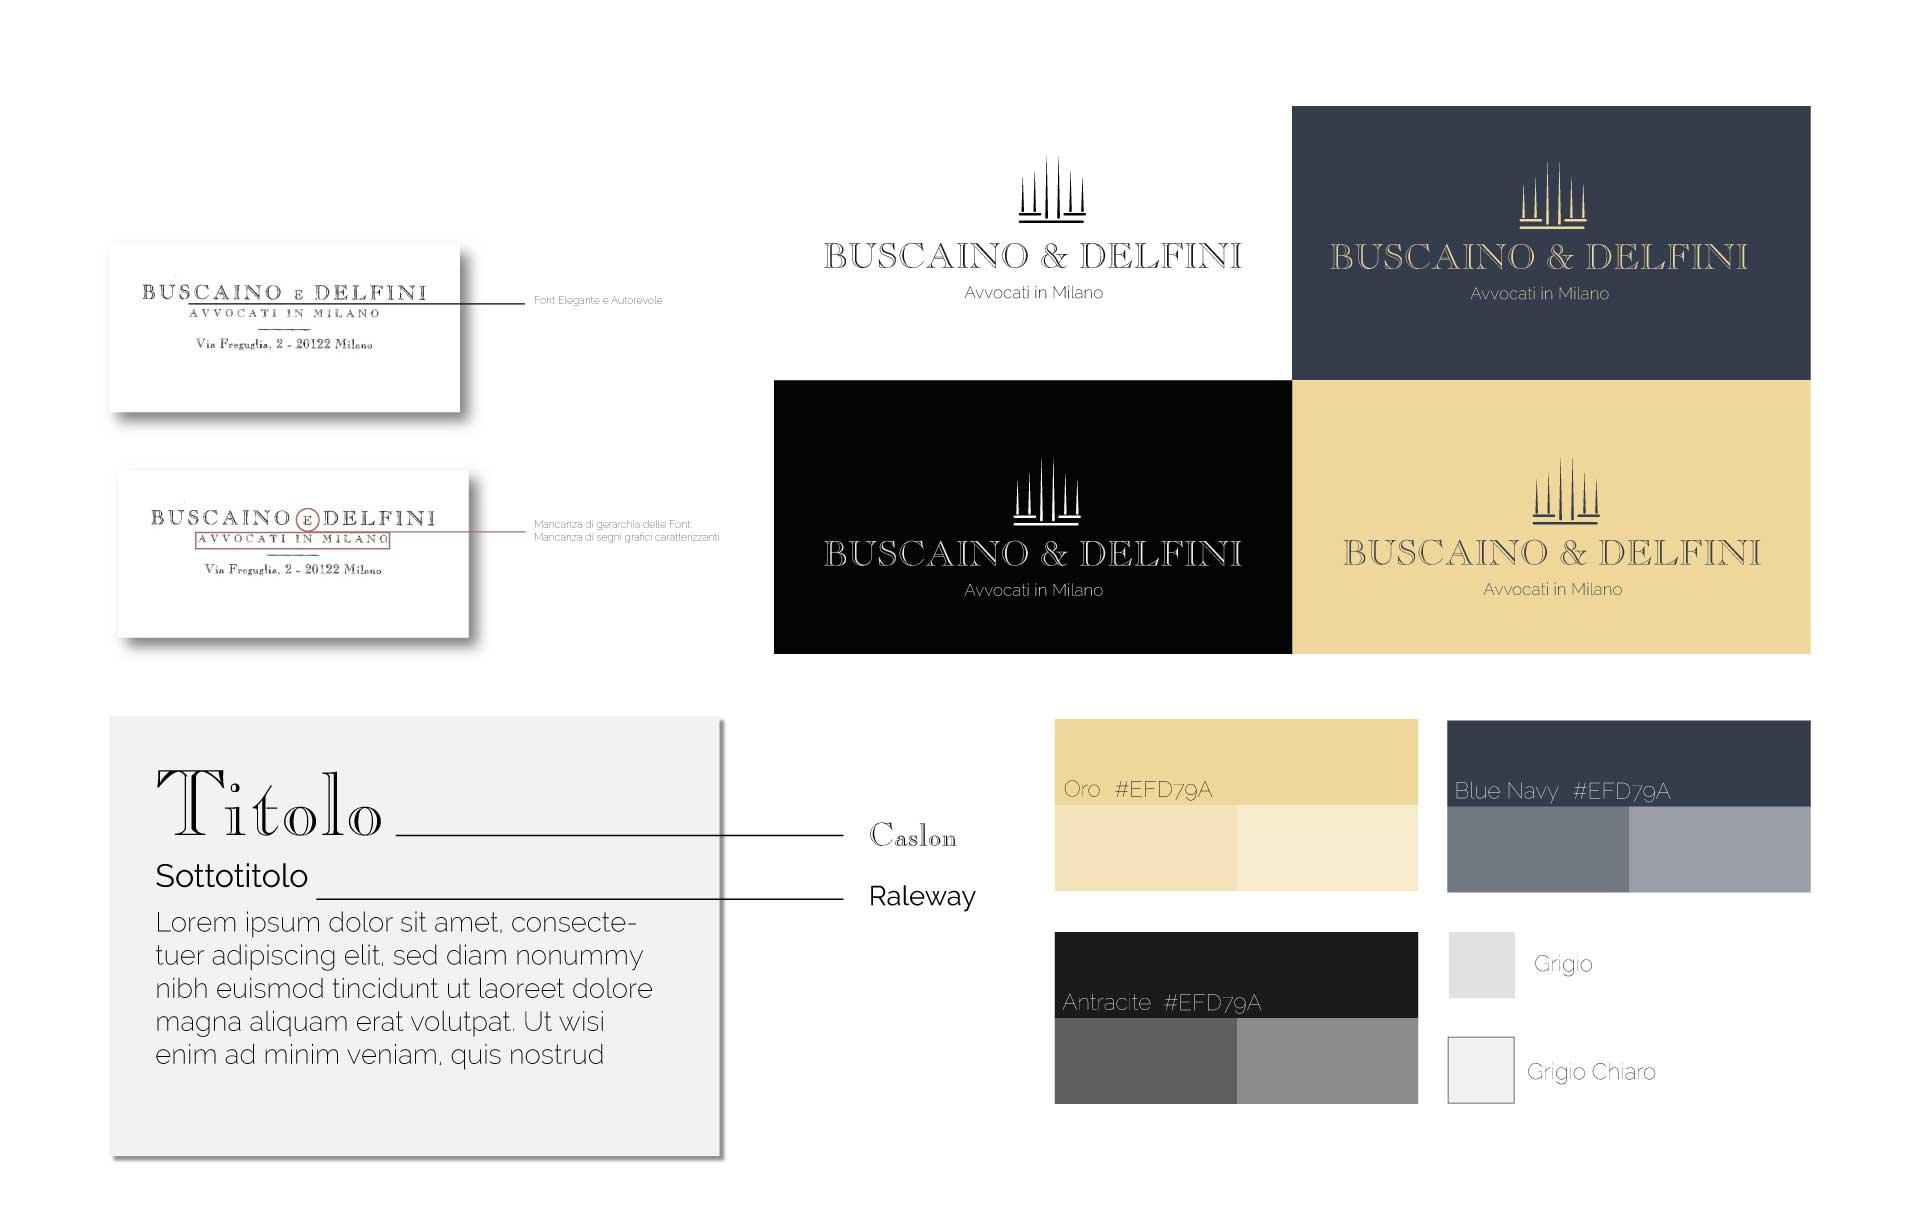 buscaino & delfini moodmama sito brochure web branding rebranding